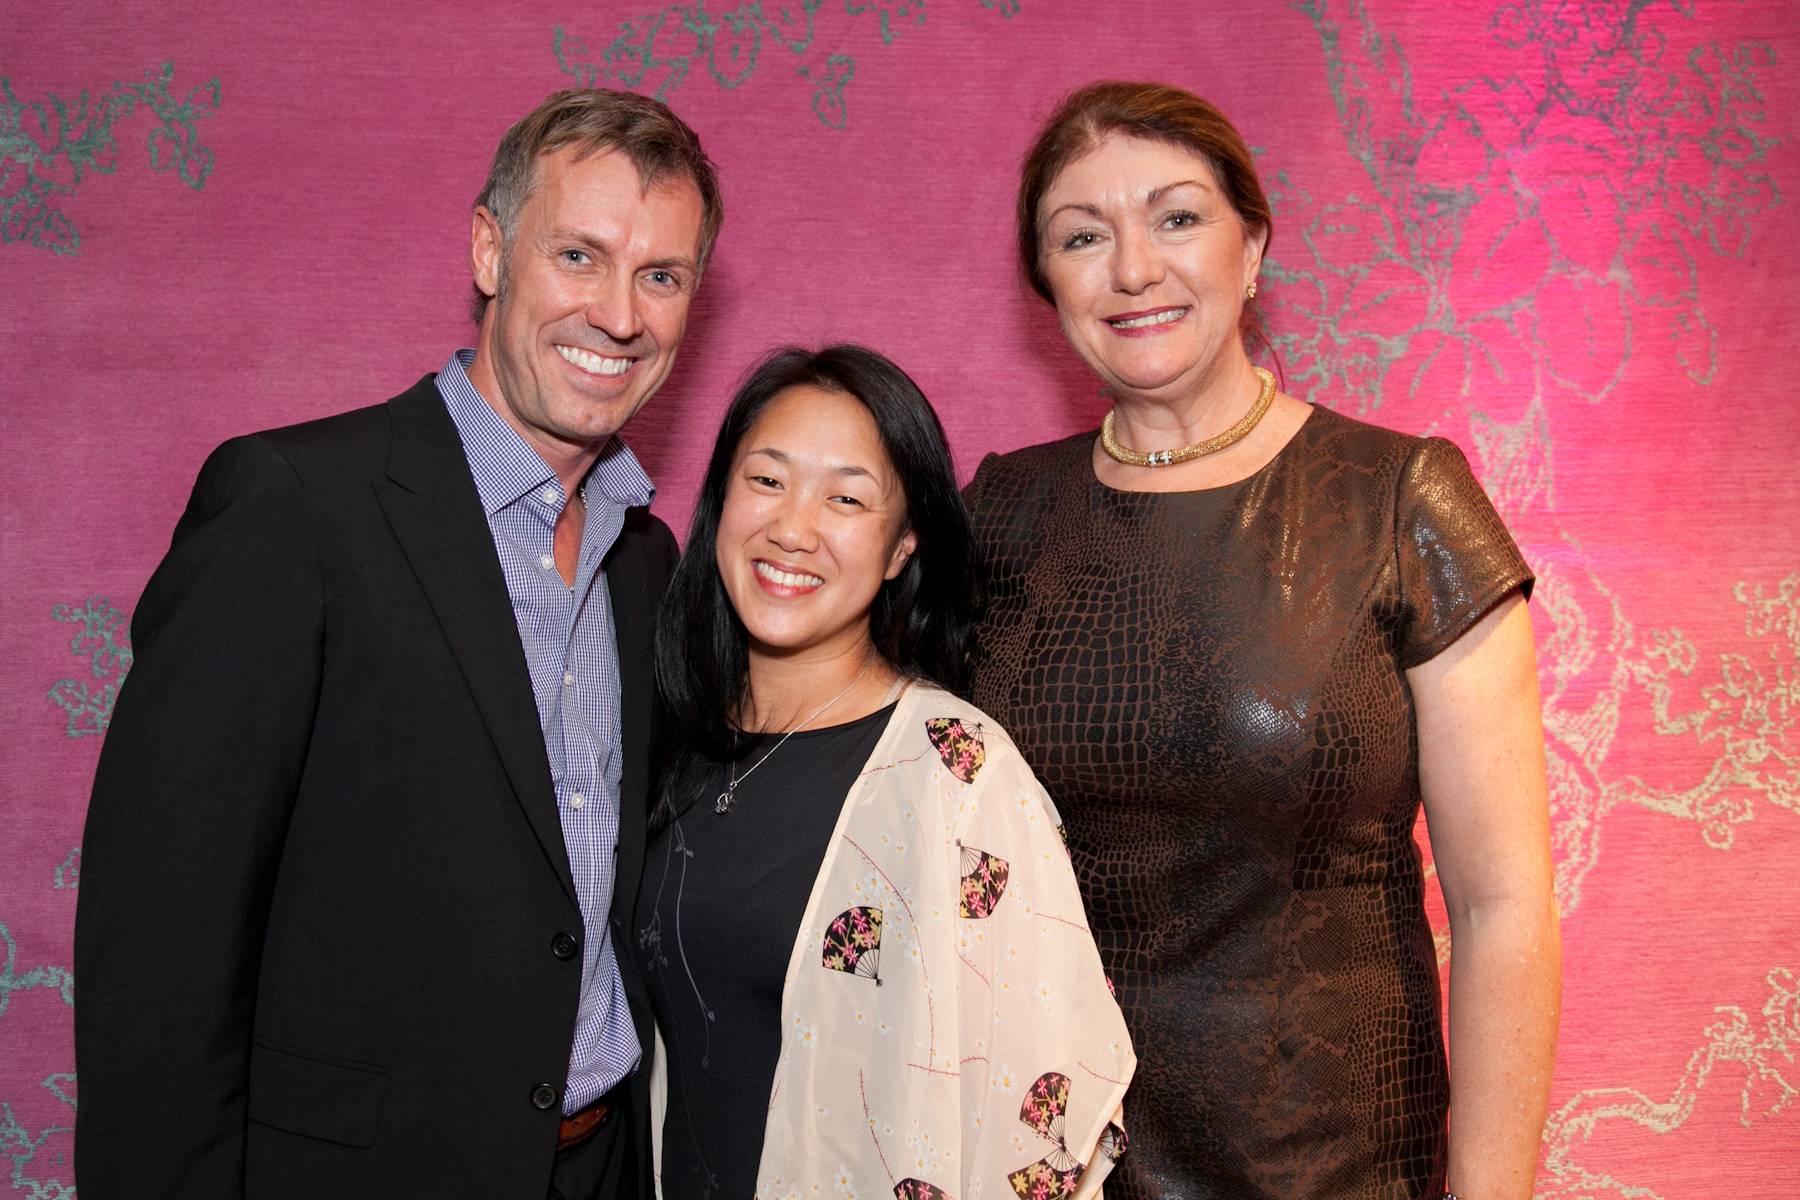 Designer David Mast,  Kimi Nishikawa and Dwell President Michela O'Connor Abrams